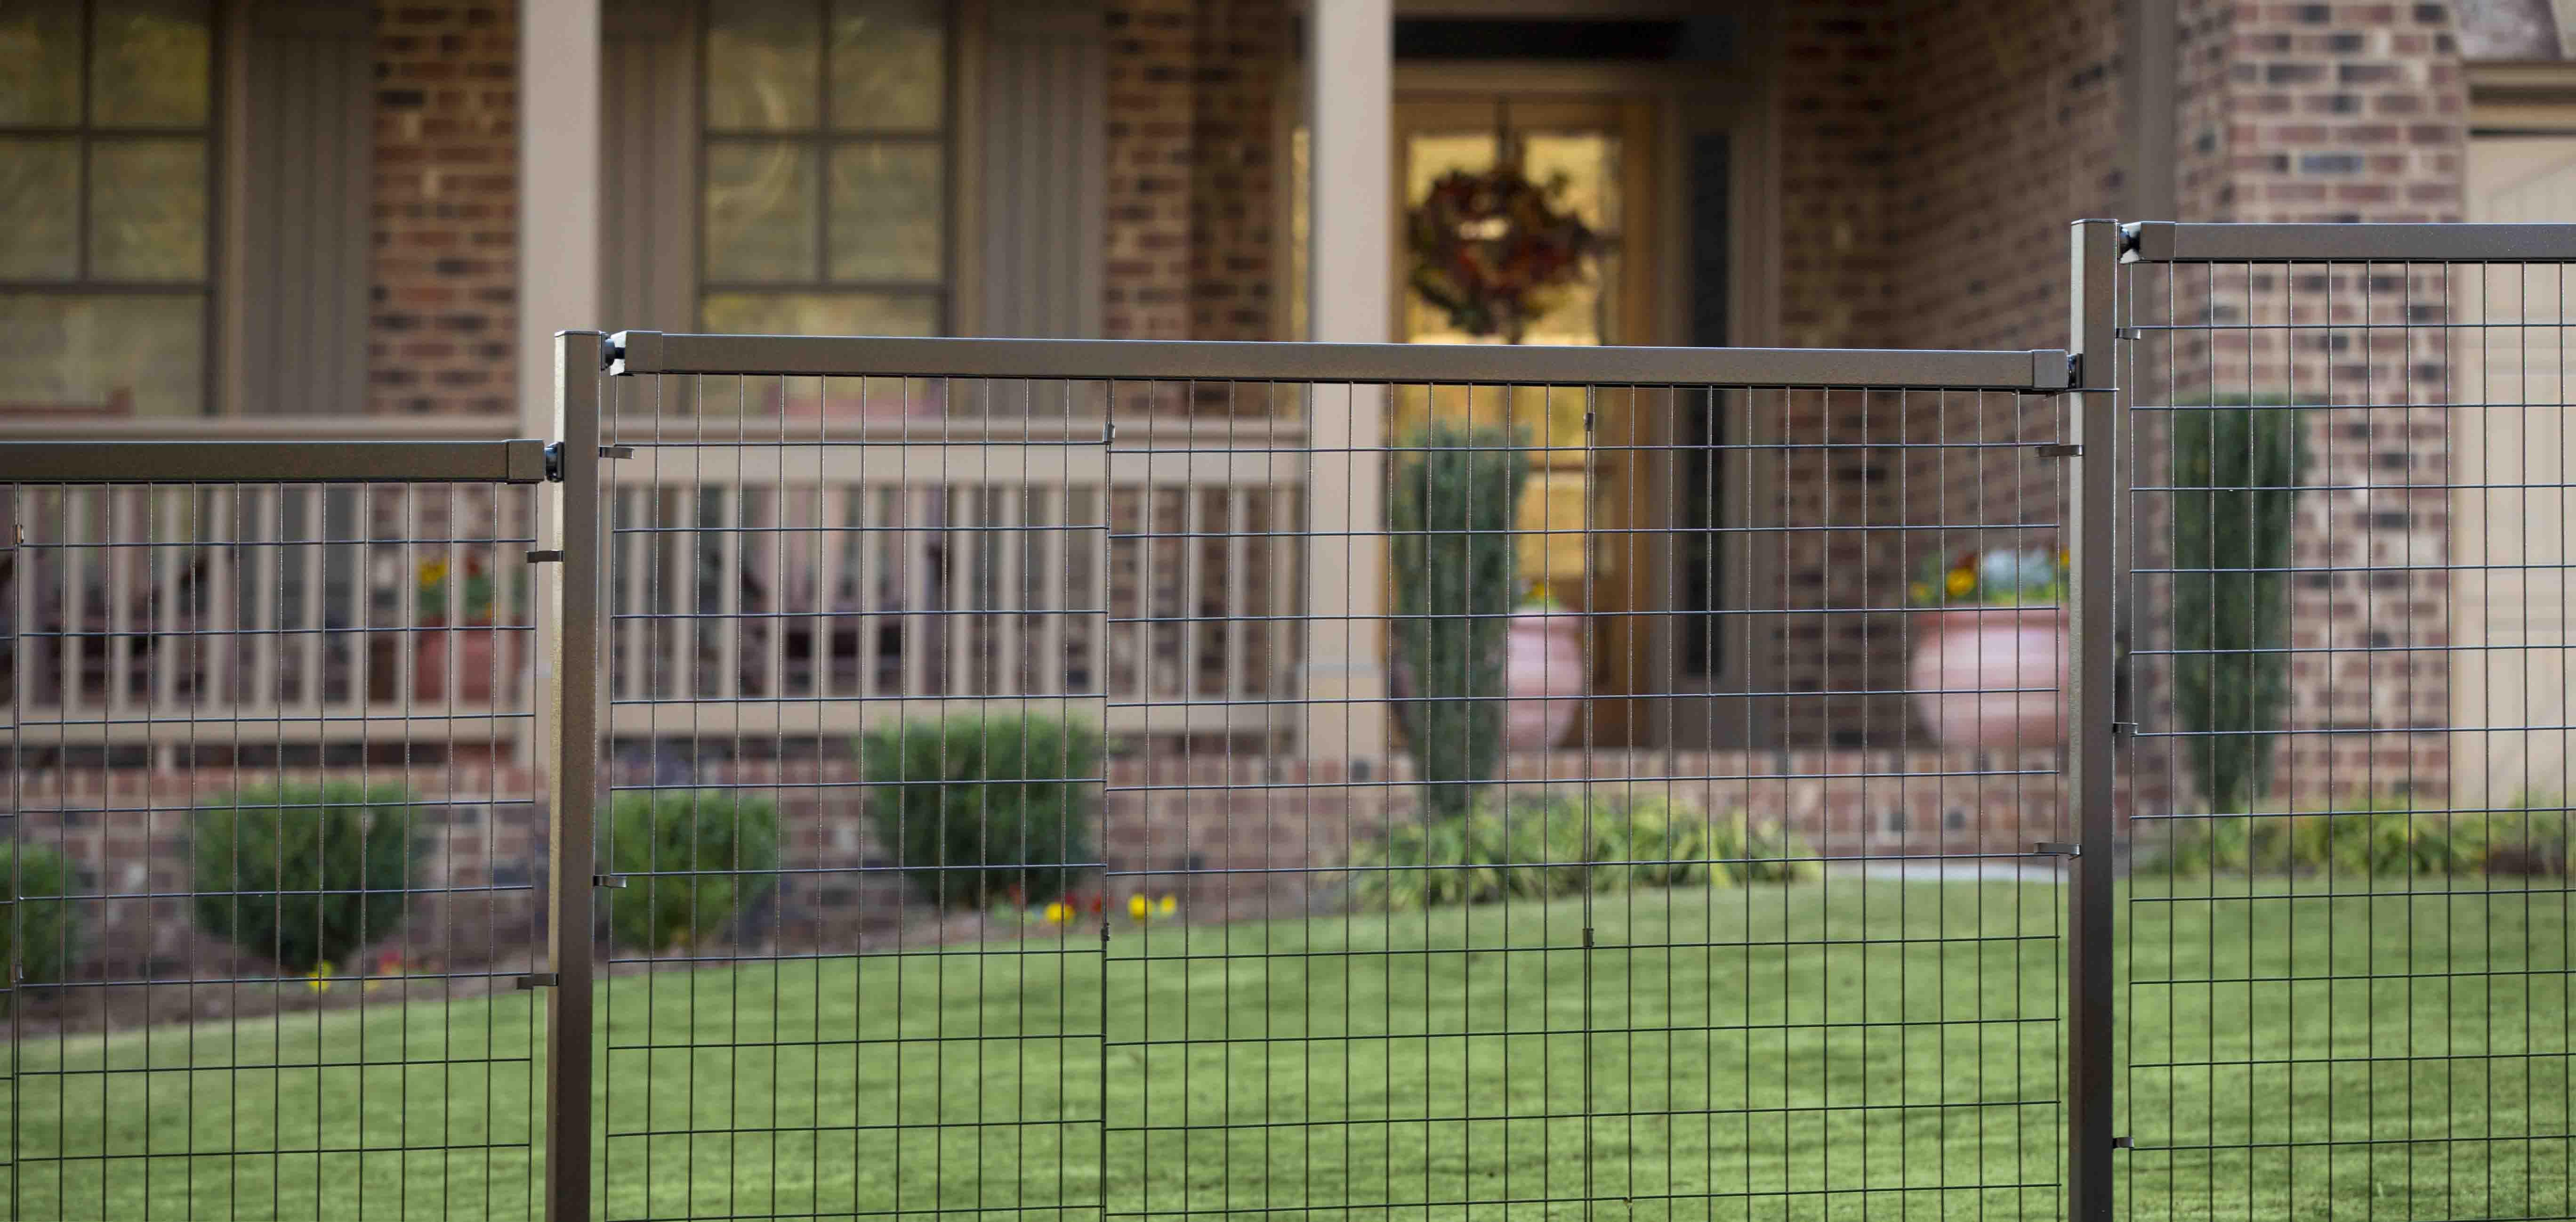 yard gard select decorative steel fencing | yard gard select